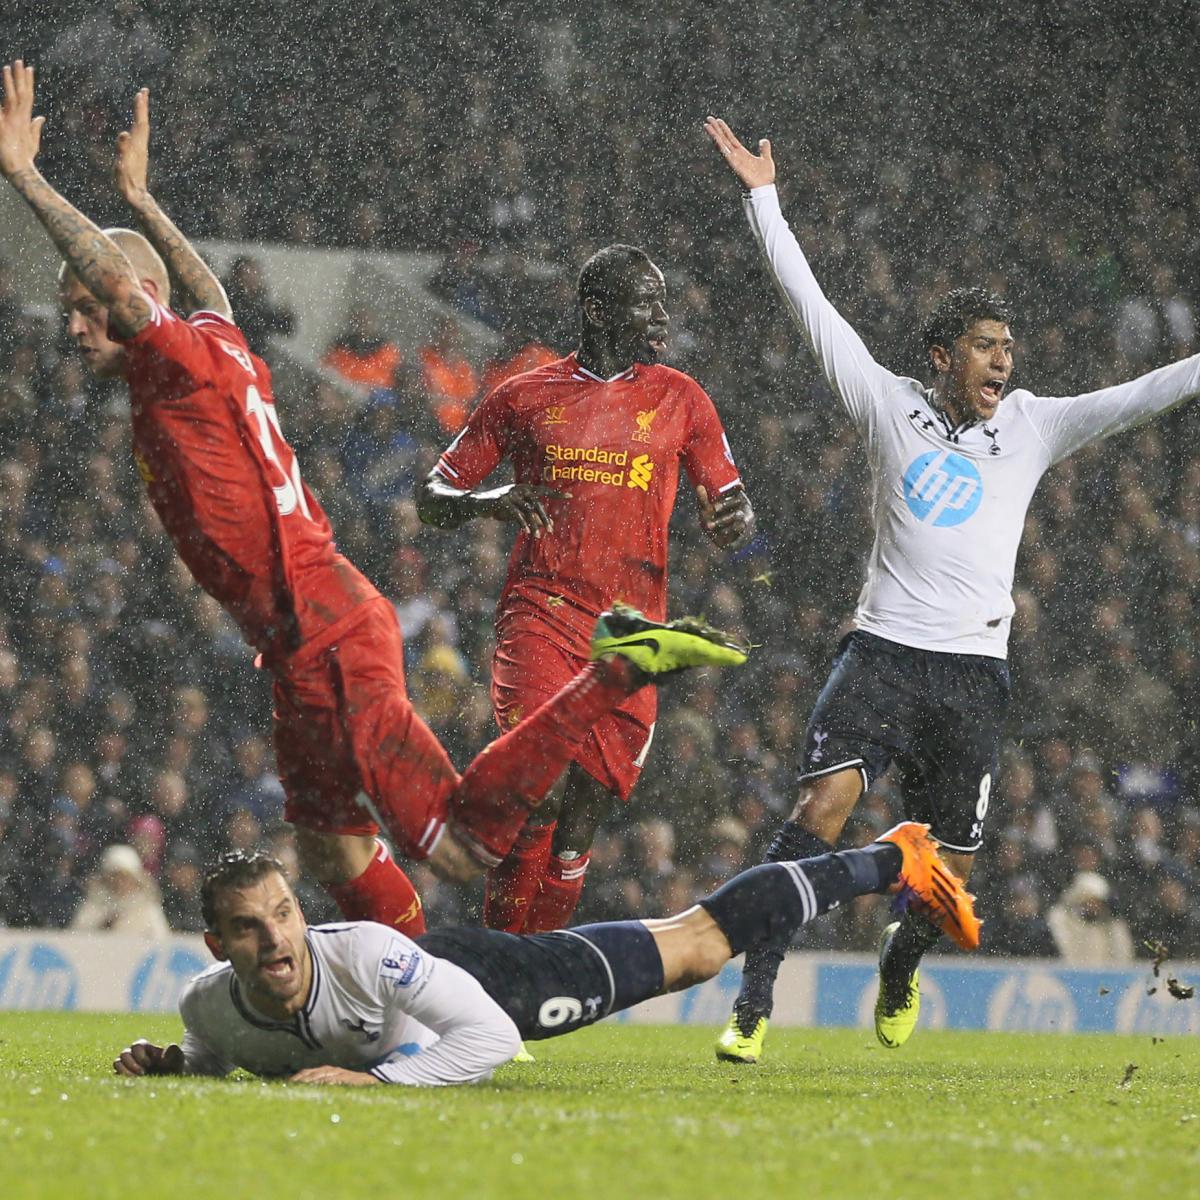 Live Streaming Soccer News Liverpool Vs Benfica Live: Liverpool Vs. Tottenham: Date, Time, Live Stream, TV Info